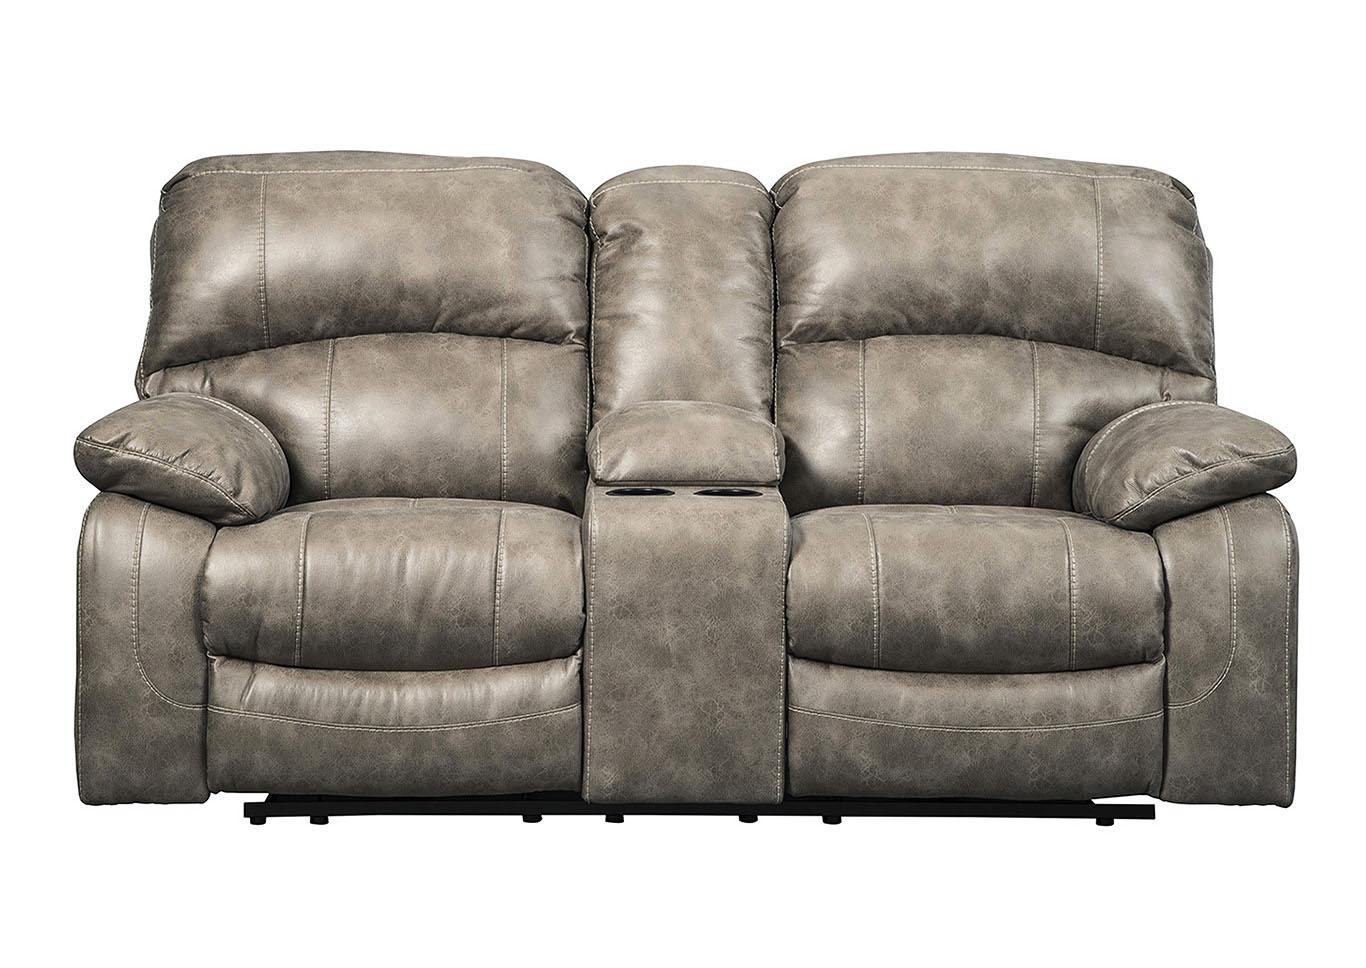 Langlois Furniture. Exellent Langlois Langlois Furniture Furniture Muskegon  Mi Dunwell Driftwood Power Recliner Loveseat On